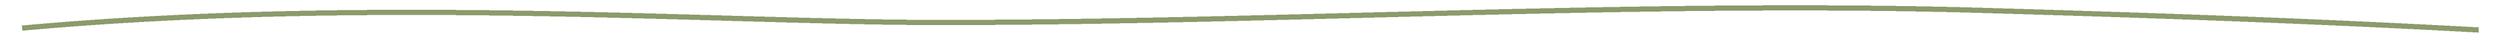 lavendersblue website line.png